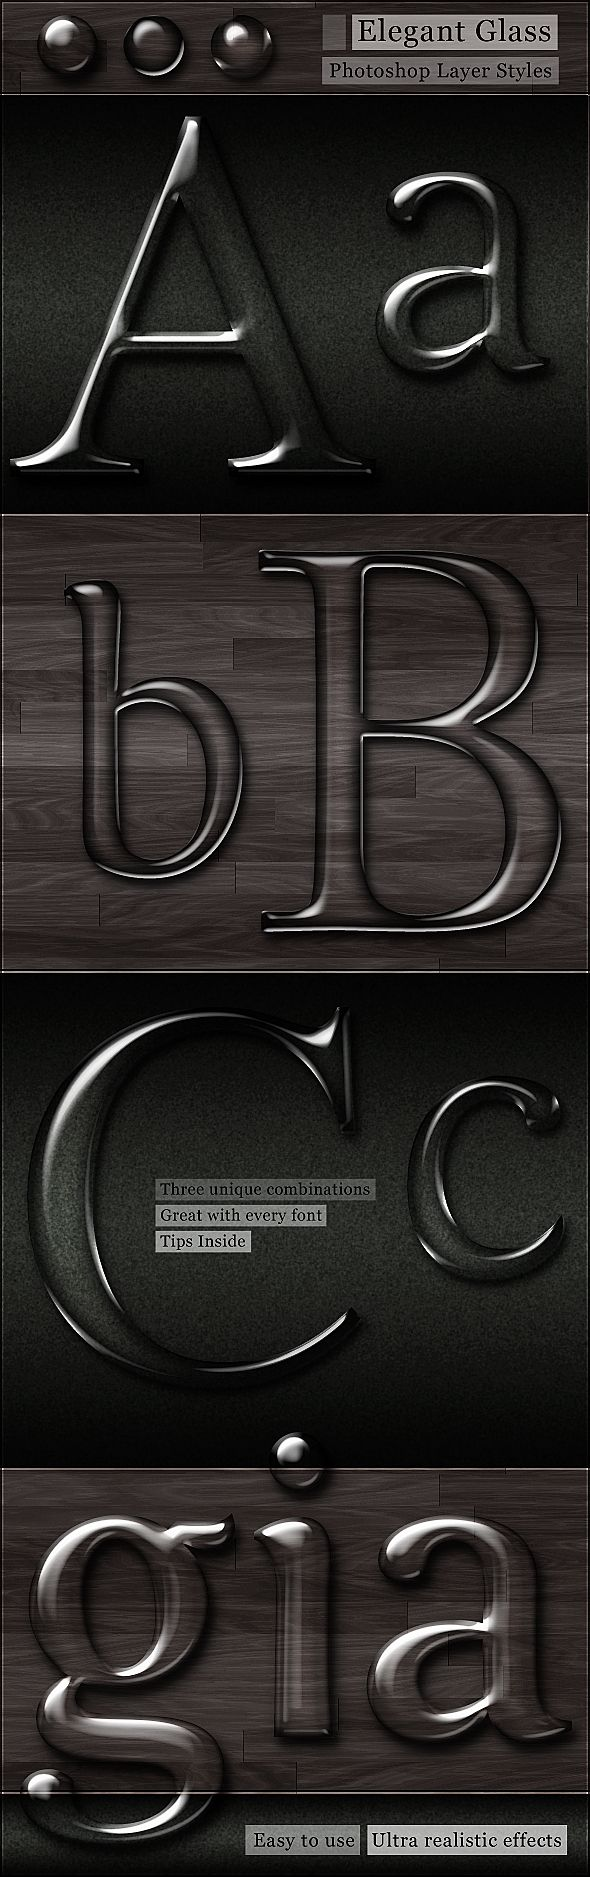 Free Glass Photoshop Styles by Giallo86 (Gianluca Giacoppo) Giallo86.deviantart.com on DeviantArt http://www.deviantart.com/